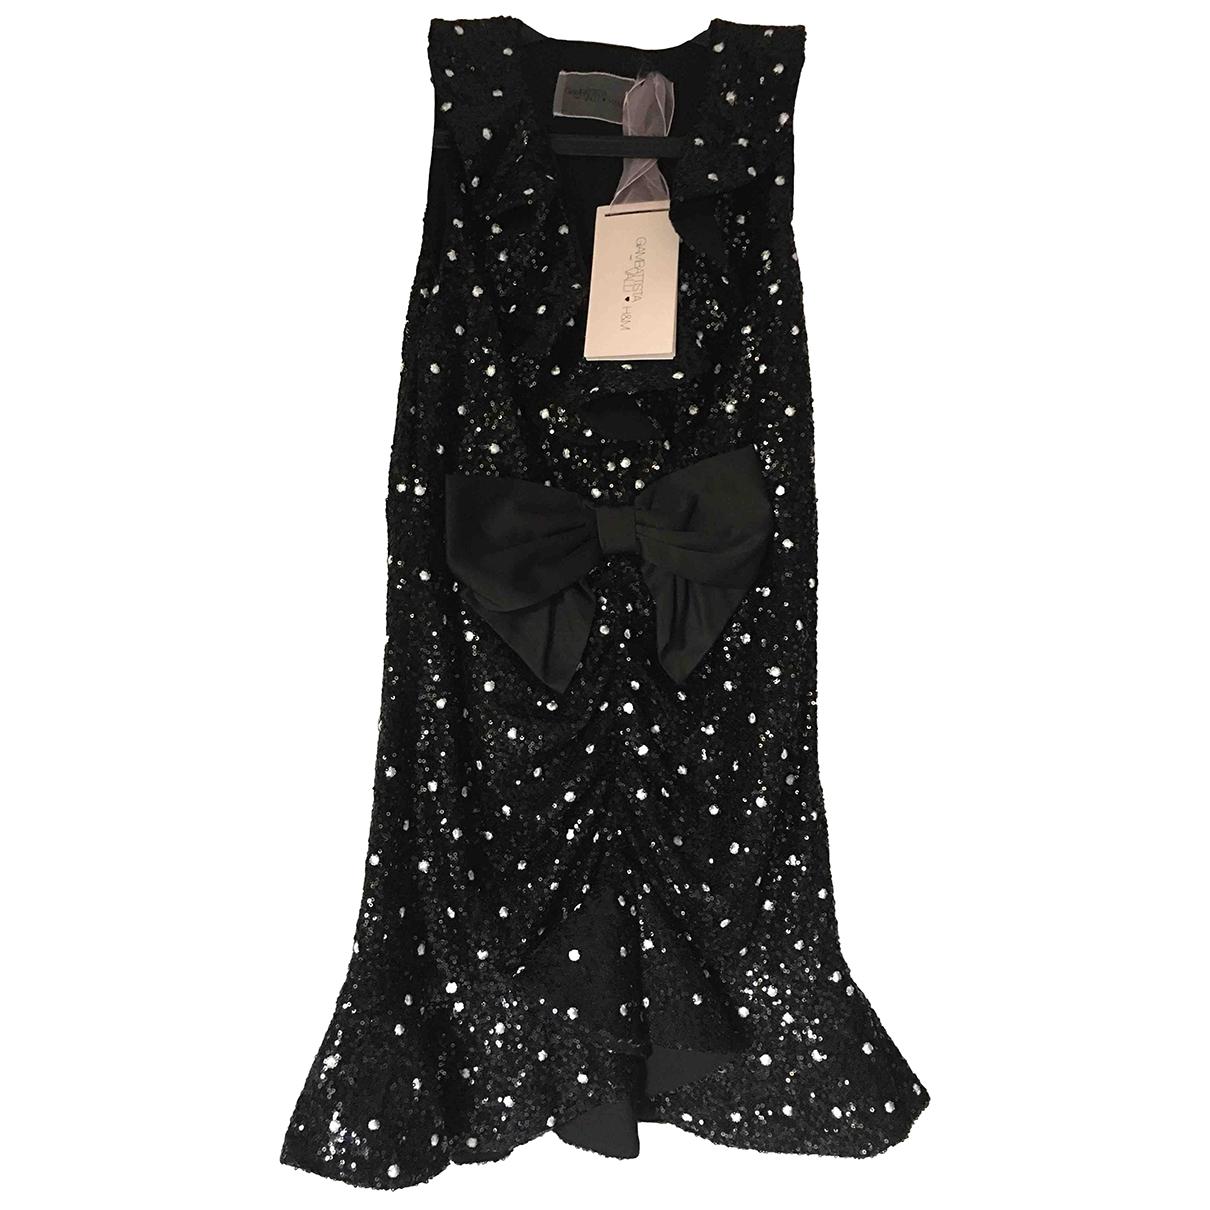 Giambattista Valli X H&m \N Black Glitter dress for Women 40 FR